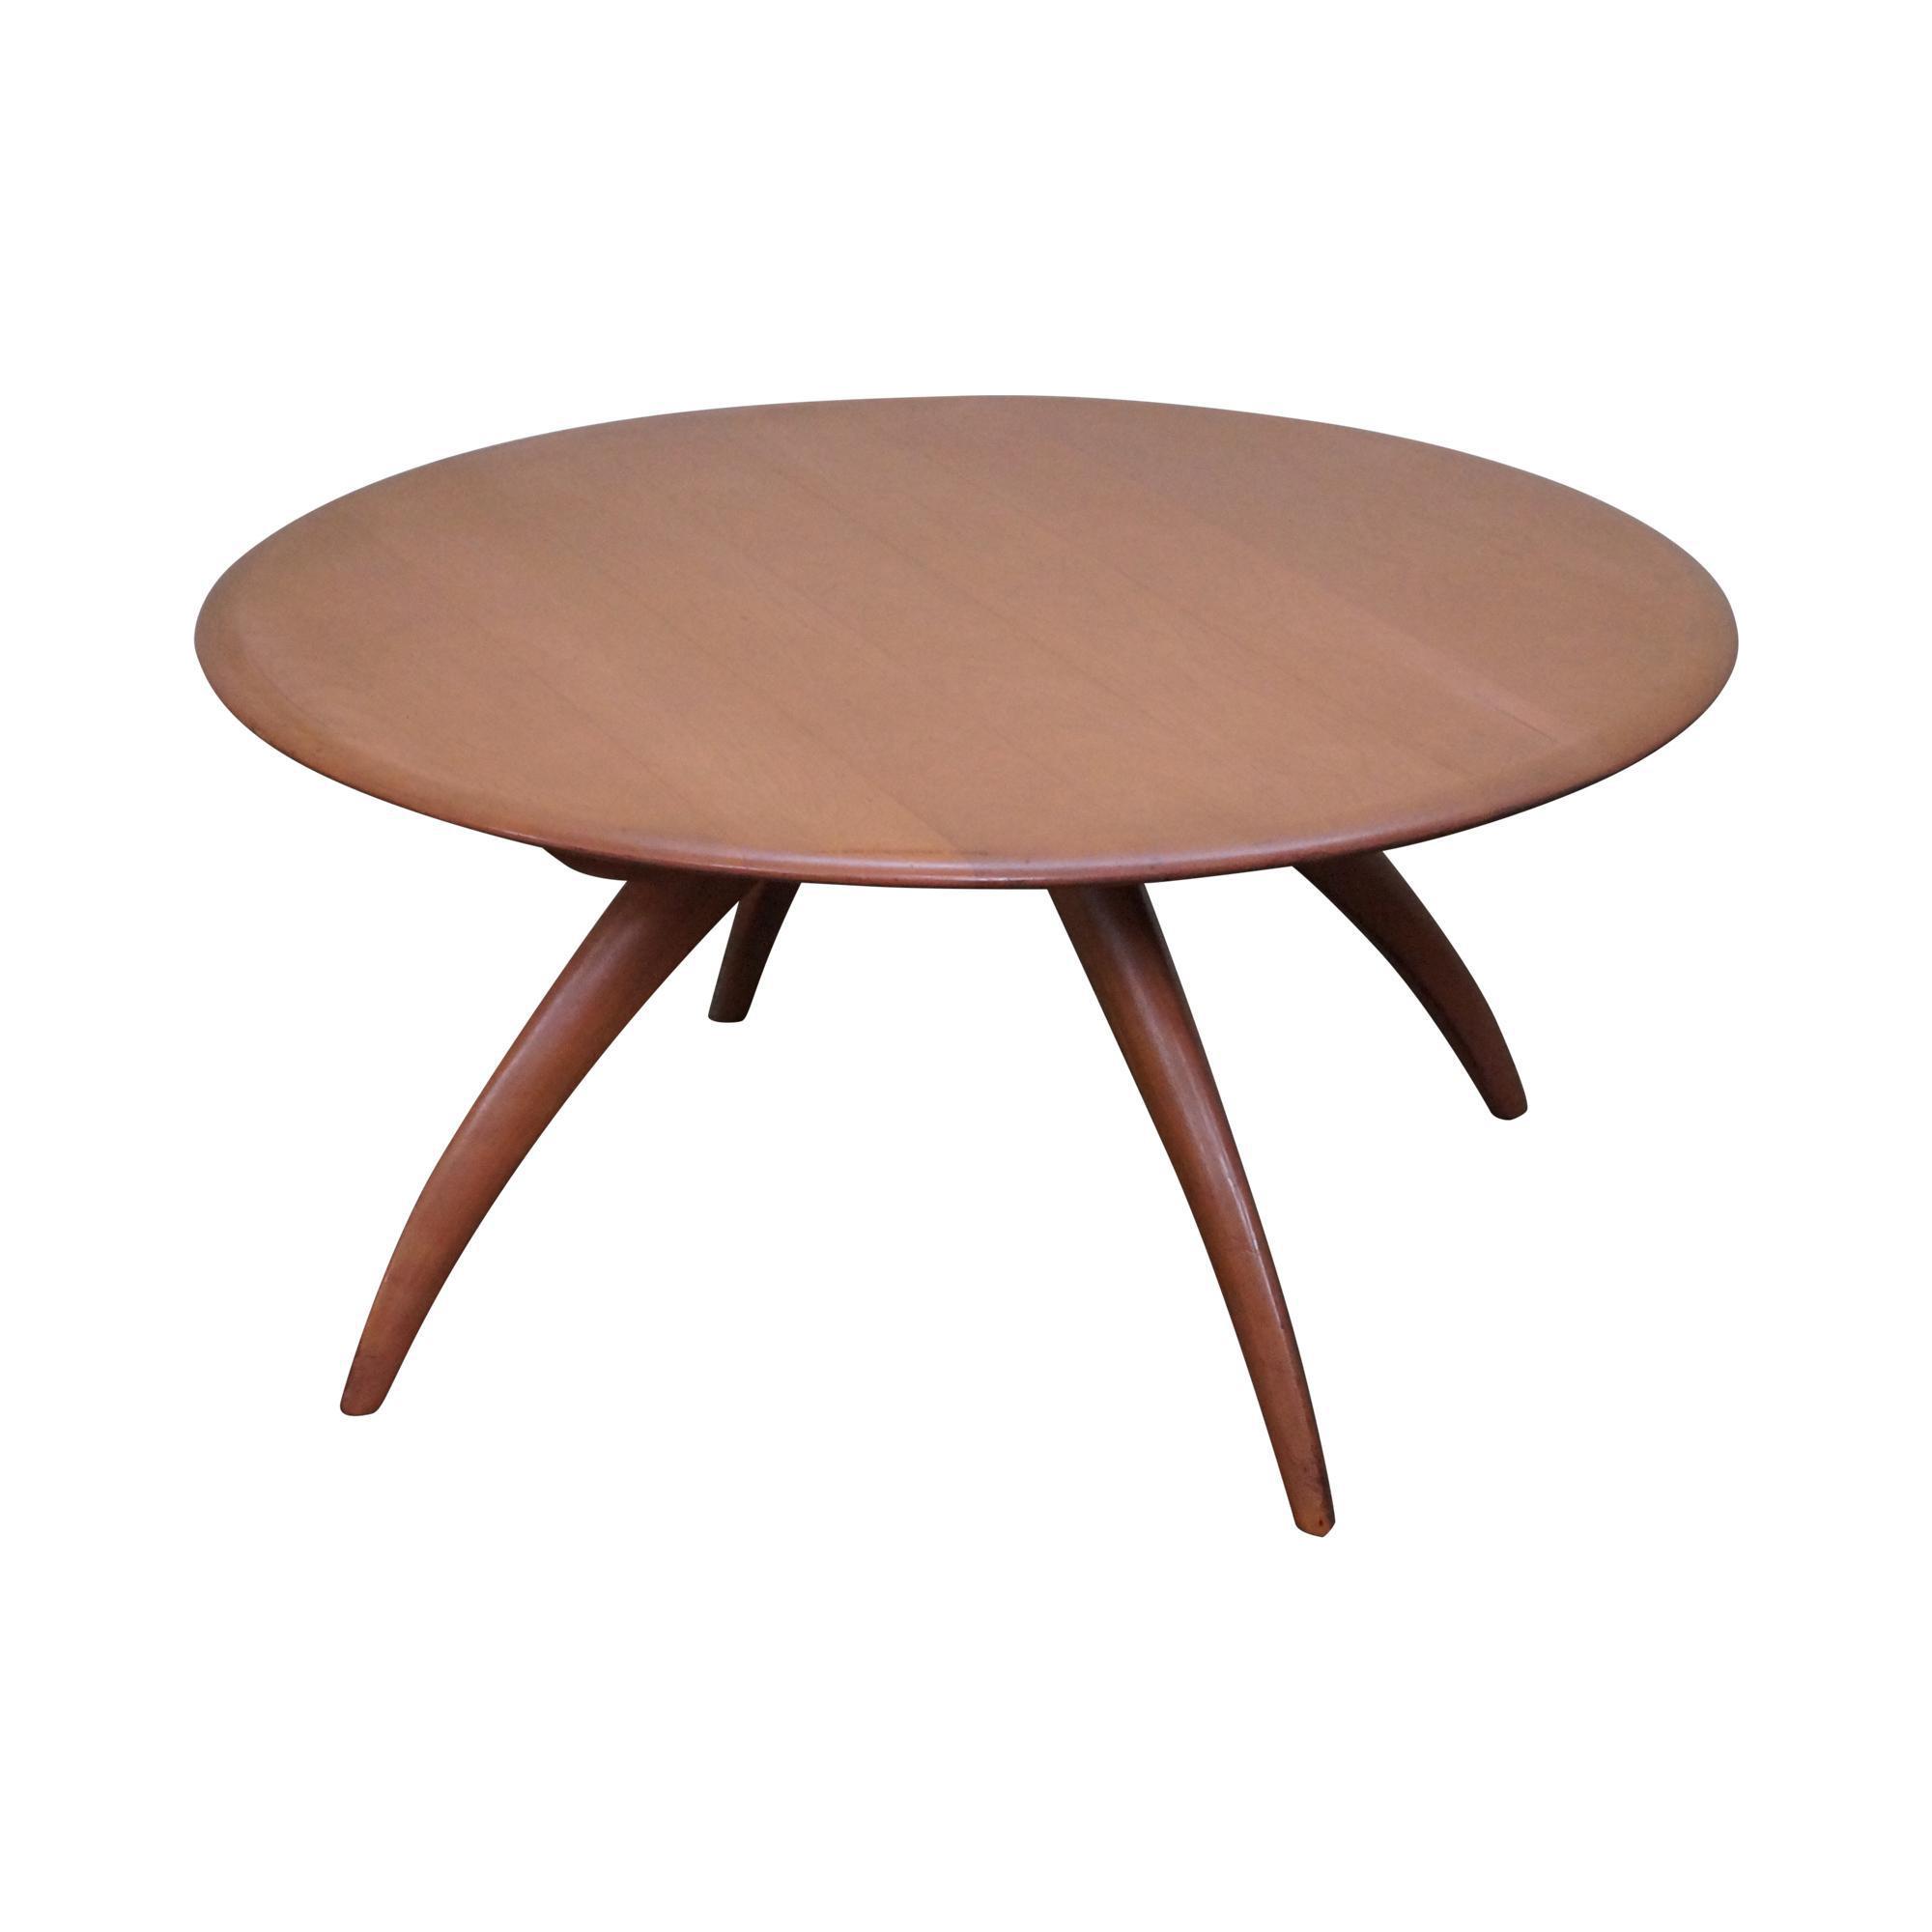 Heywood Wakefield Revolving Maple Coffee Table